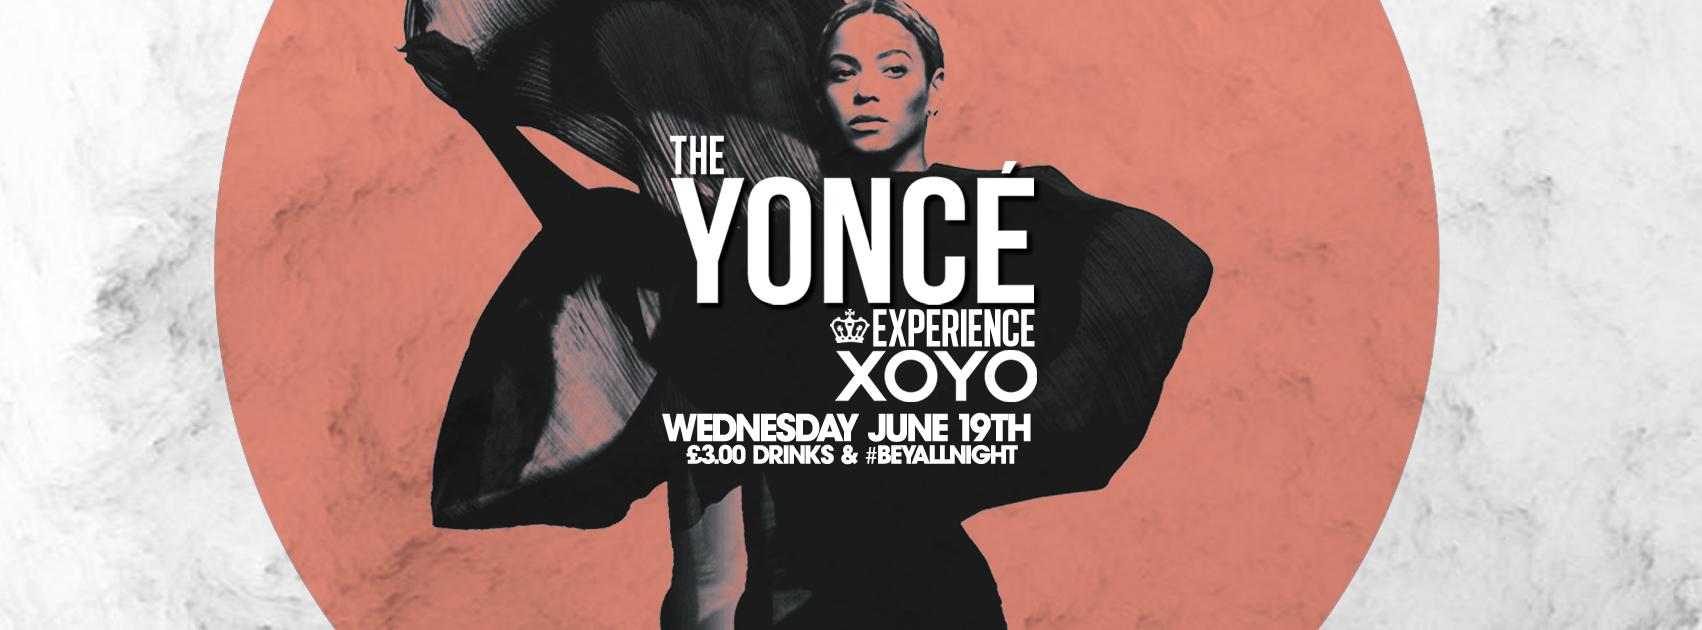 The Yoncé Experience – June 19th | XOYO LONDON